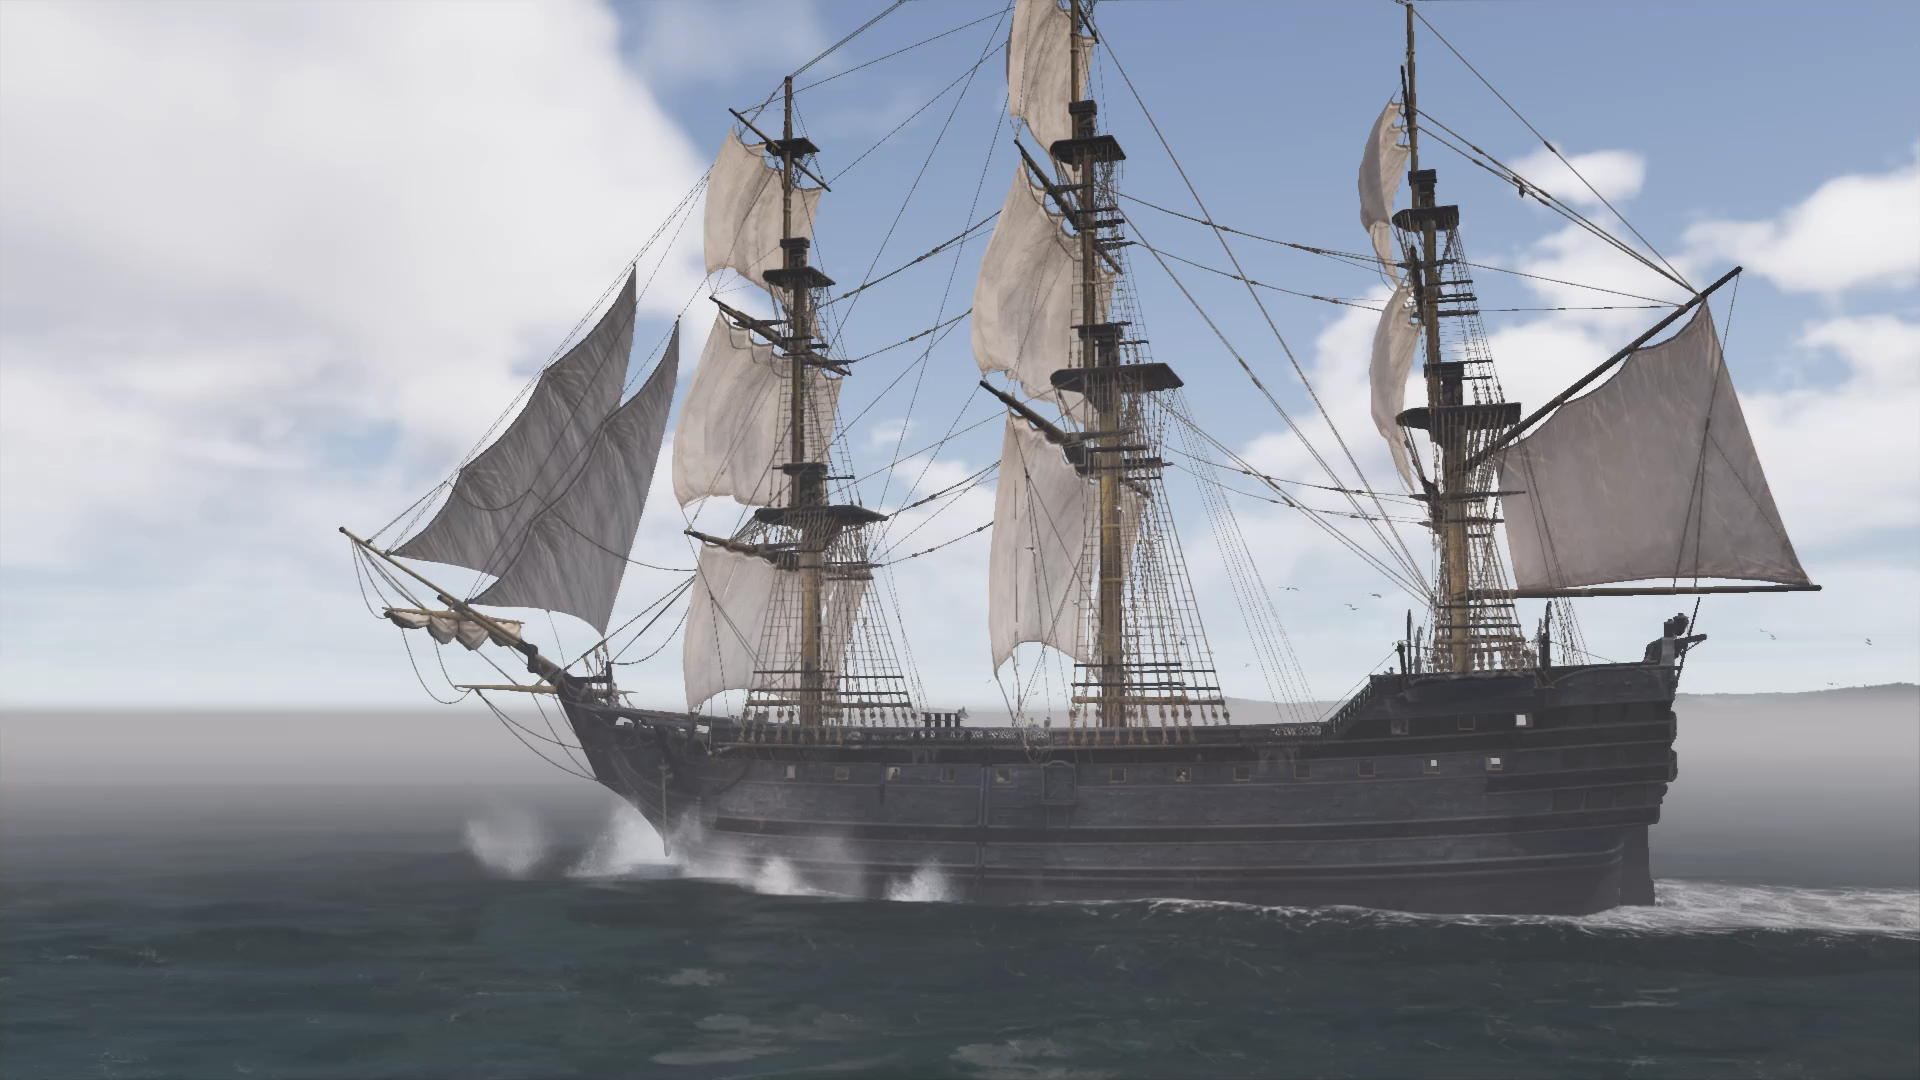 Ship | Assassin's Creed Wiki | FANDOM powered by Wikia